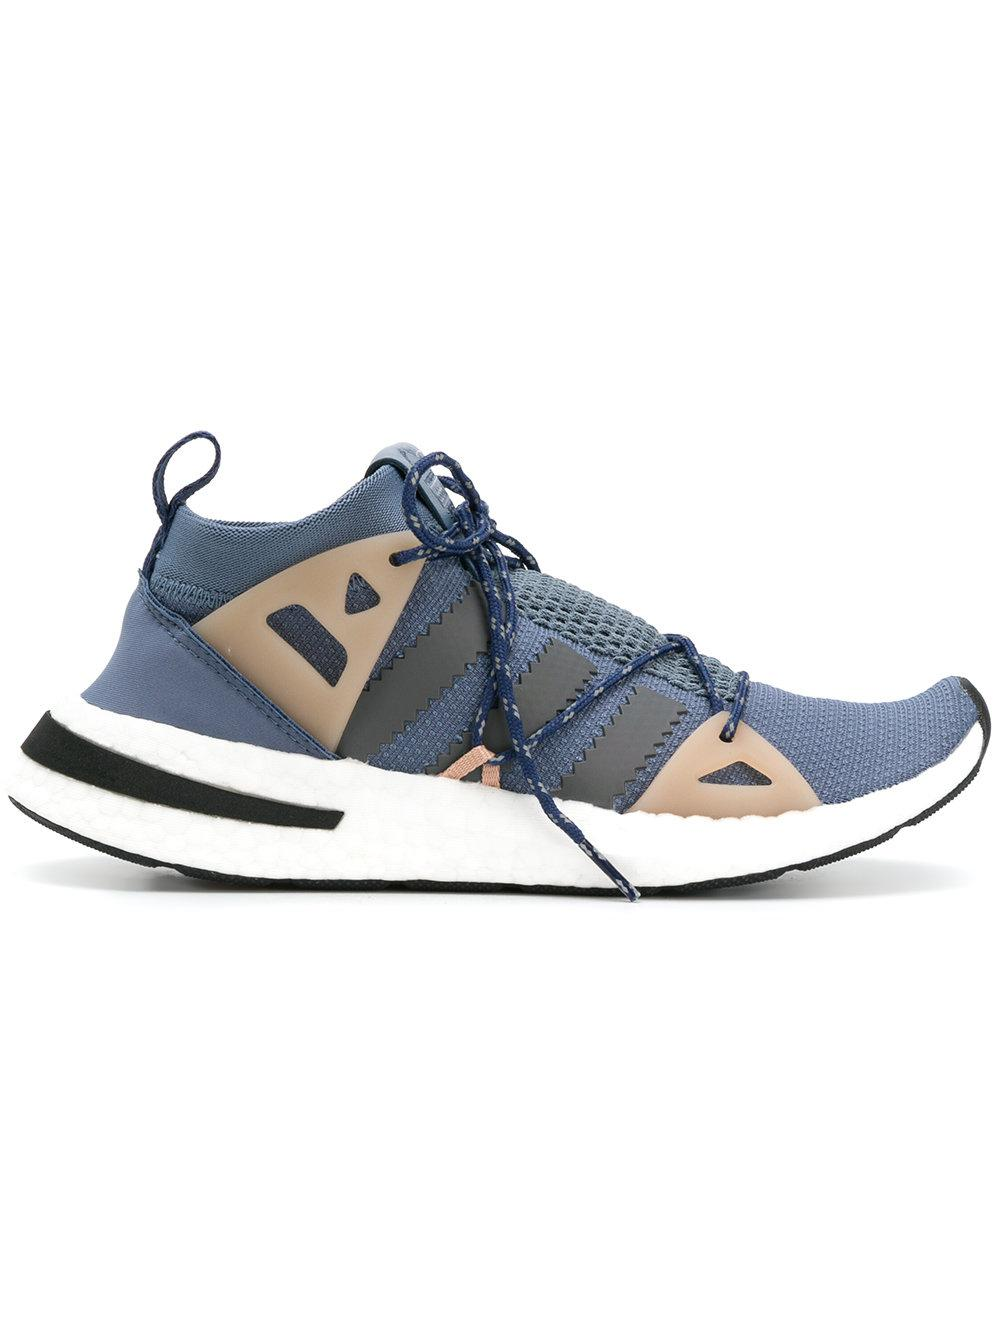 Beige and Grey ARKYN W Sneakers adidas Originals gLxOpV0vT